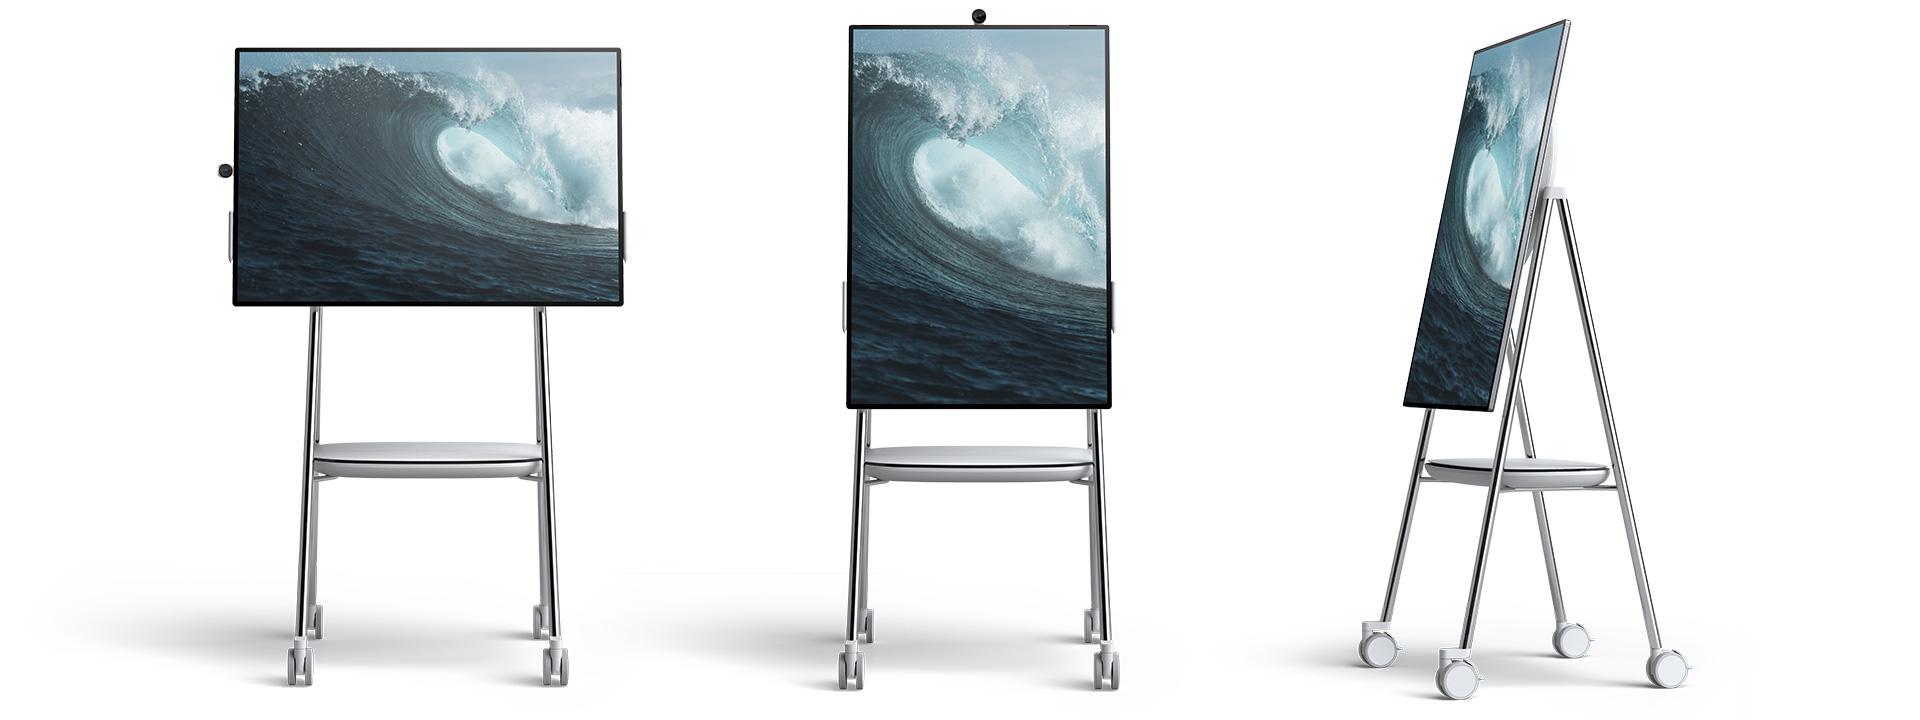 Microsoft-Surface-Hub-Store-Australia-2S-Steelcase.jpg